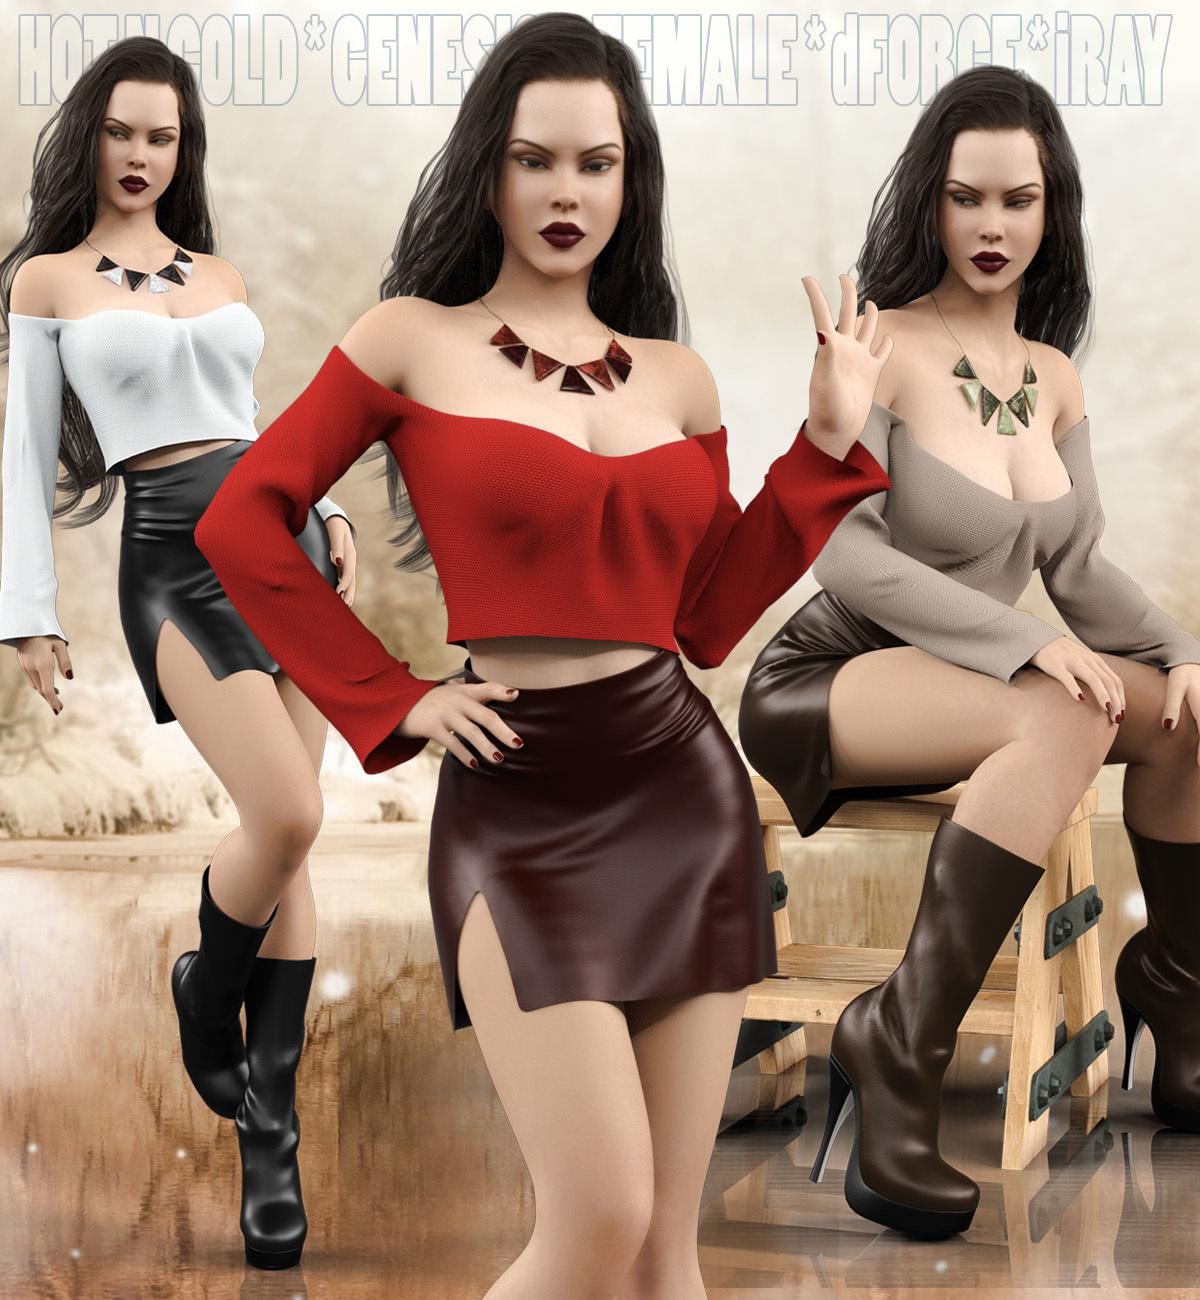 Hot Work Costume Set for Genesis 8 Females(s)